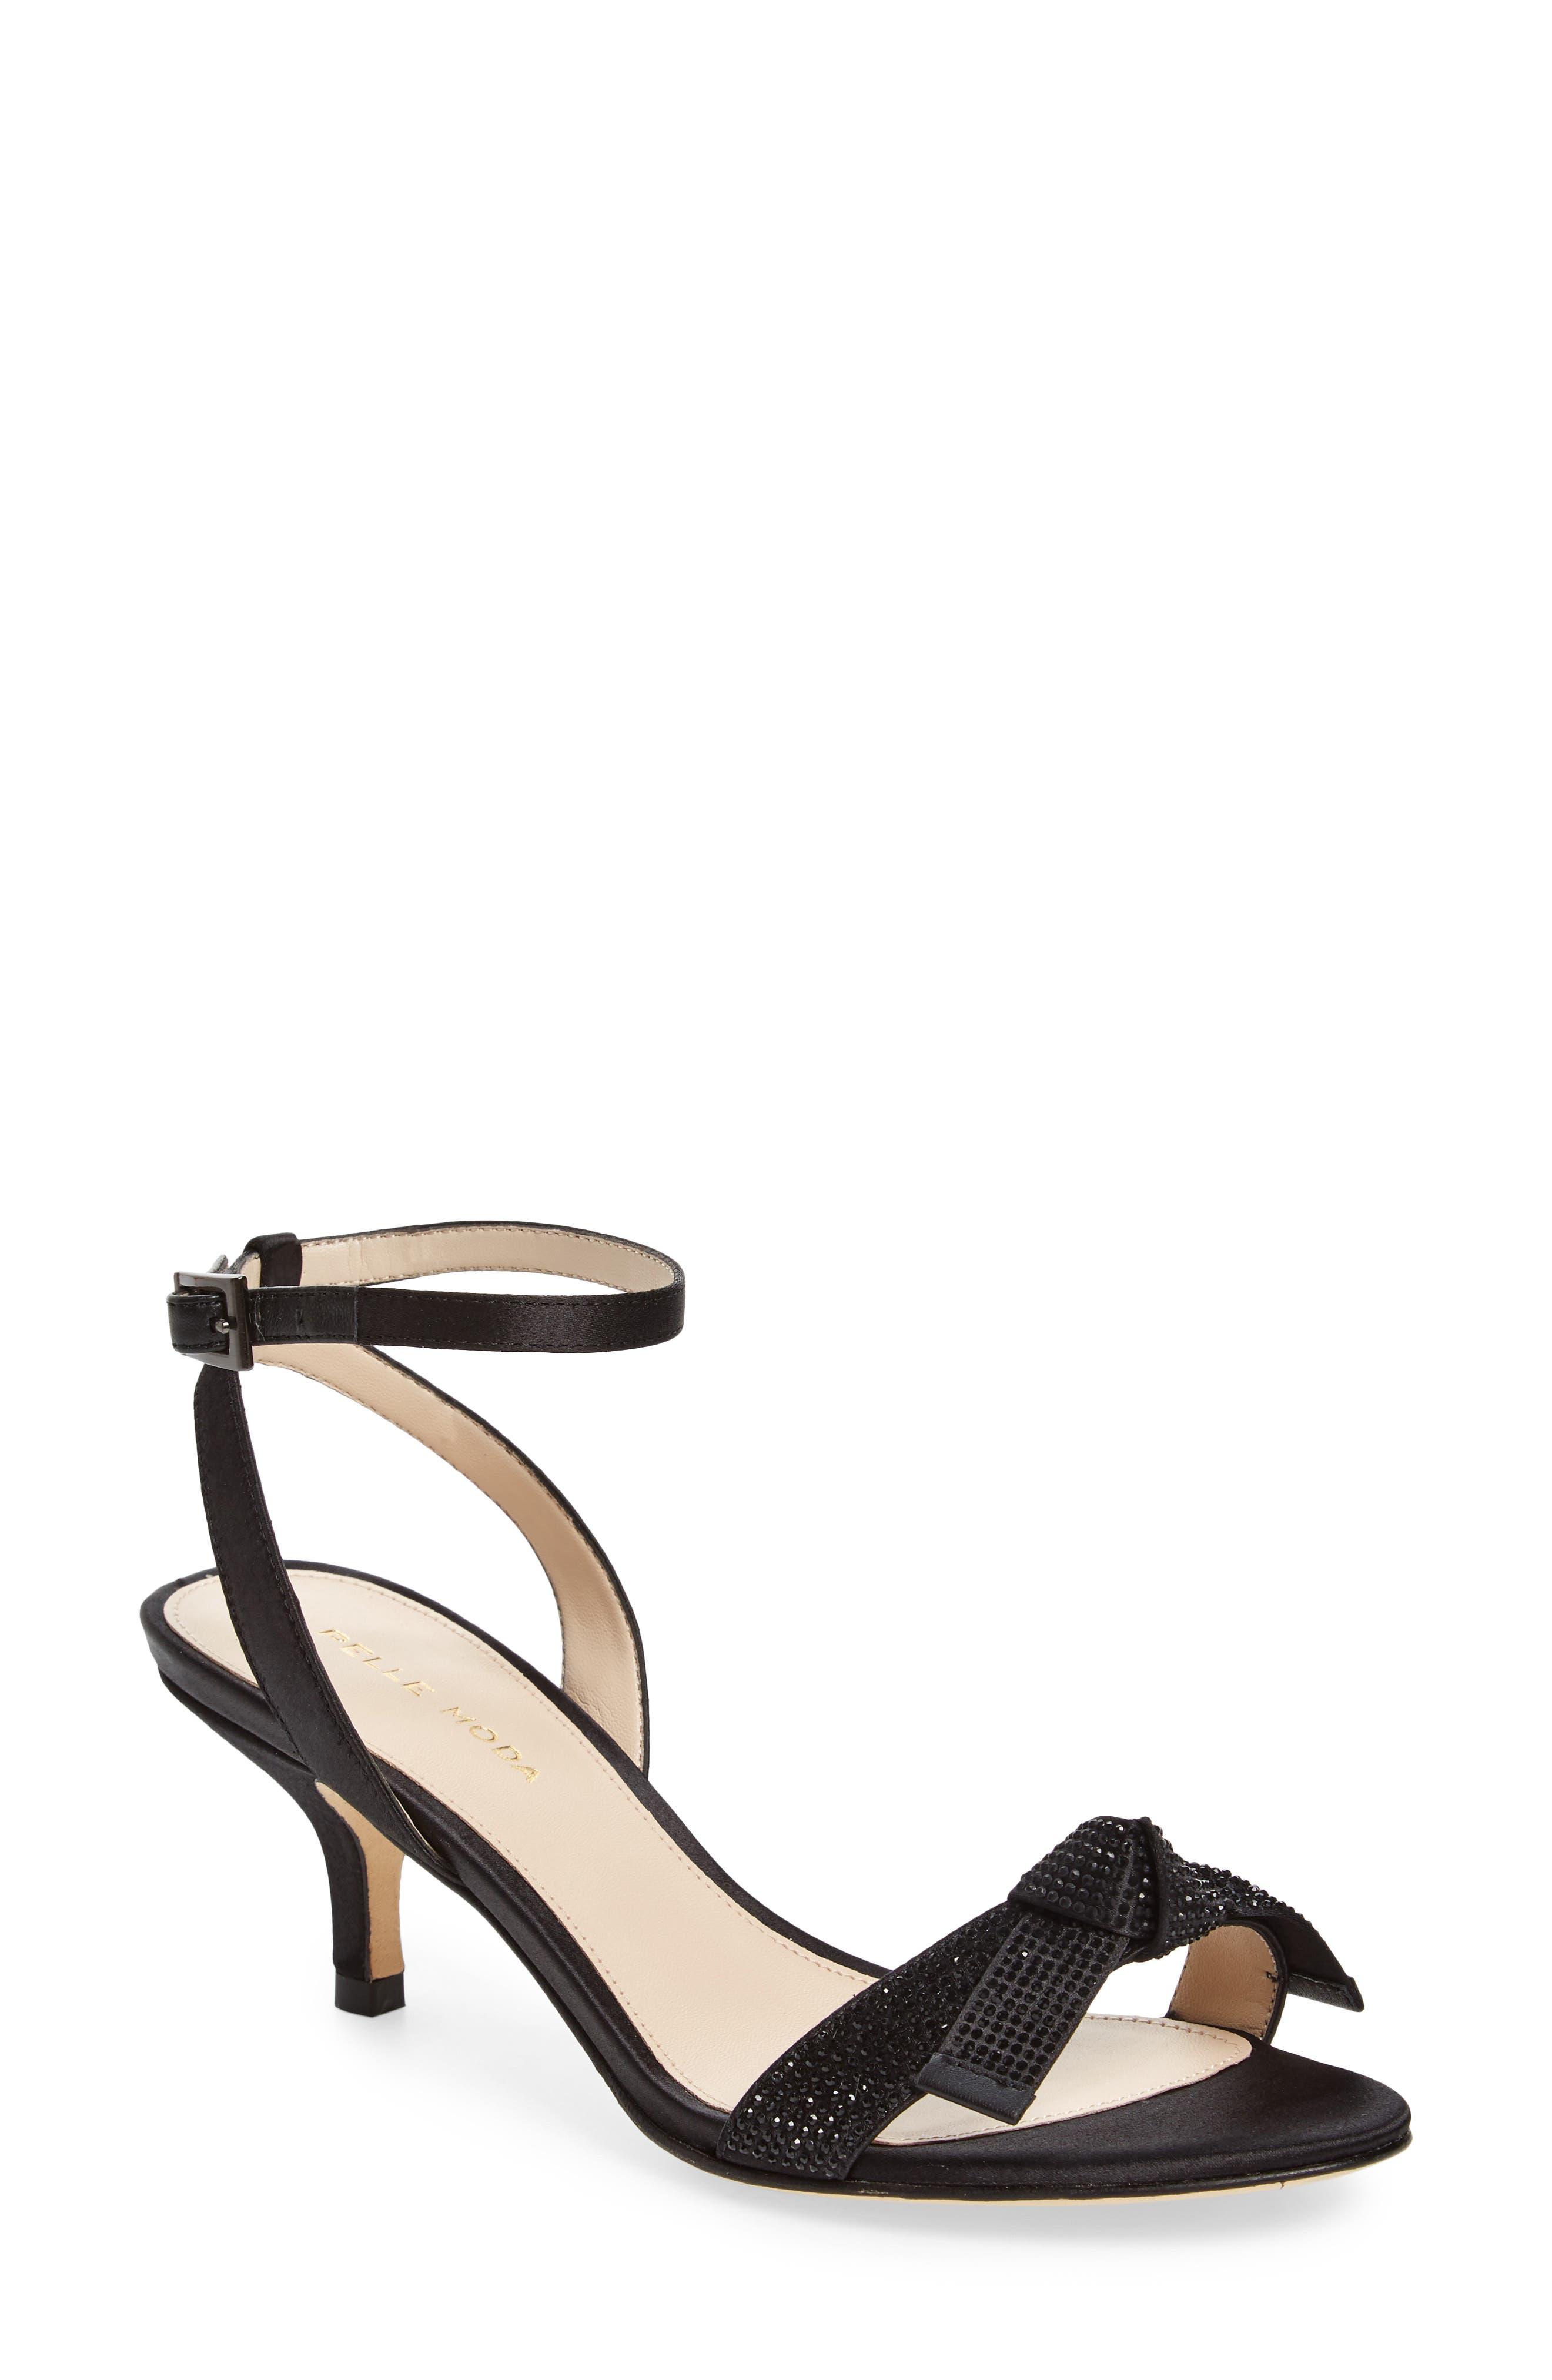 Alexia Sandal,                         Main,                         color, BLACK FABRIC